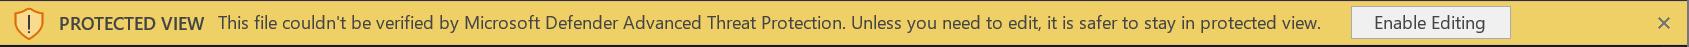 Captura de pantalla de la barra de empresa de MDATP si se produce un error al explorar el archivo